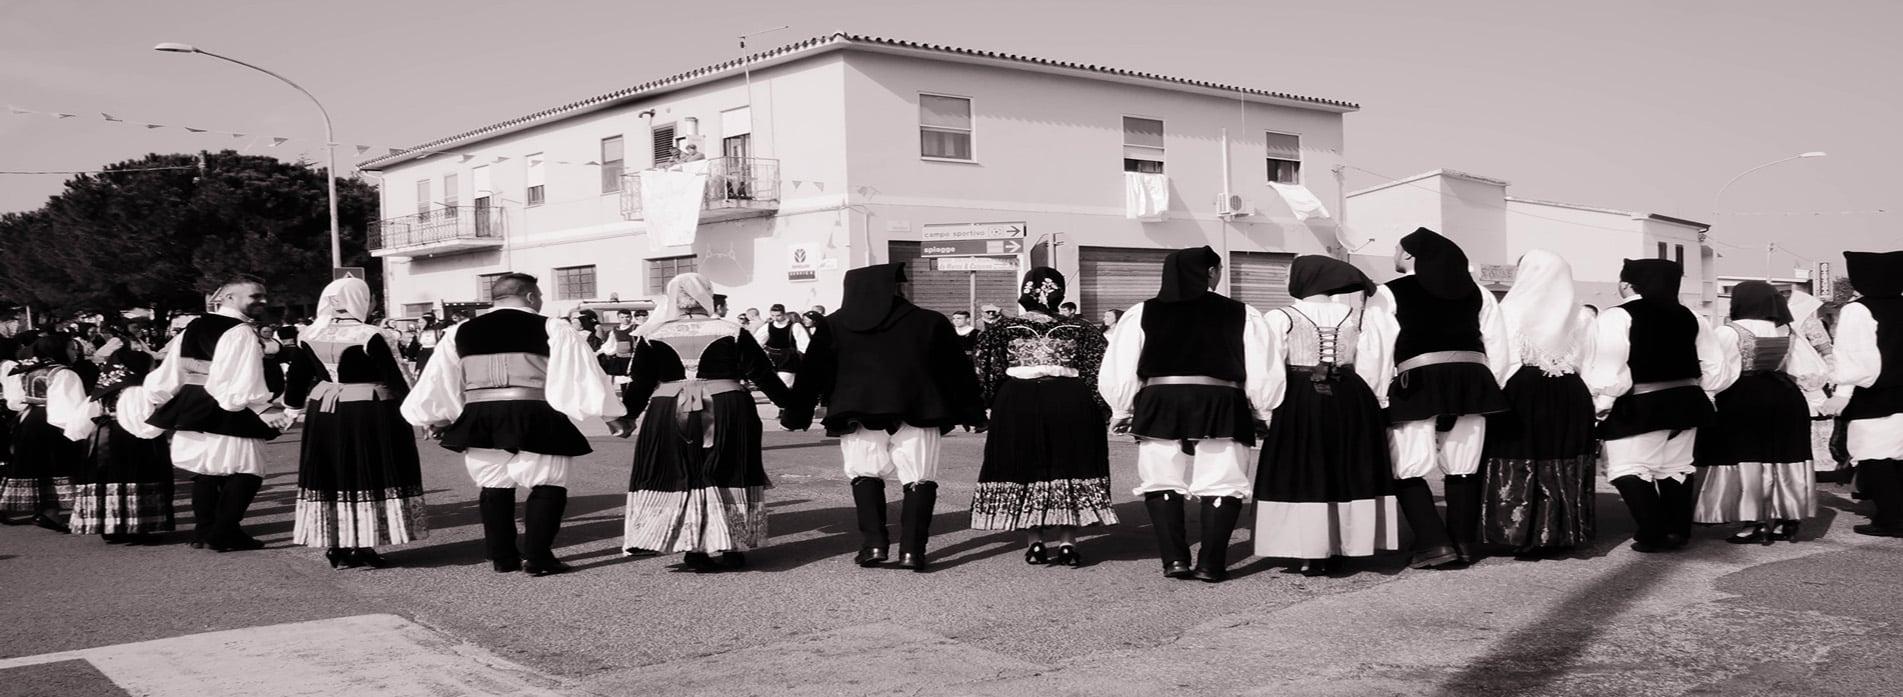 http://www.sardaterra.com/wp-content/uploads/2018/04/Su-Ballu-Brincadu.jpg